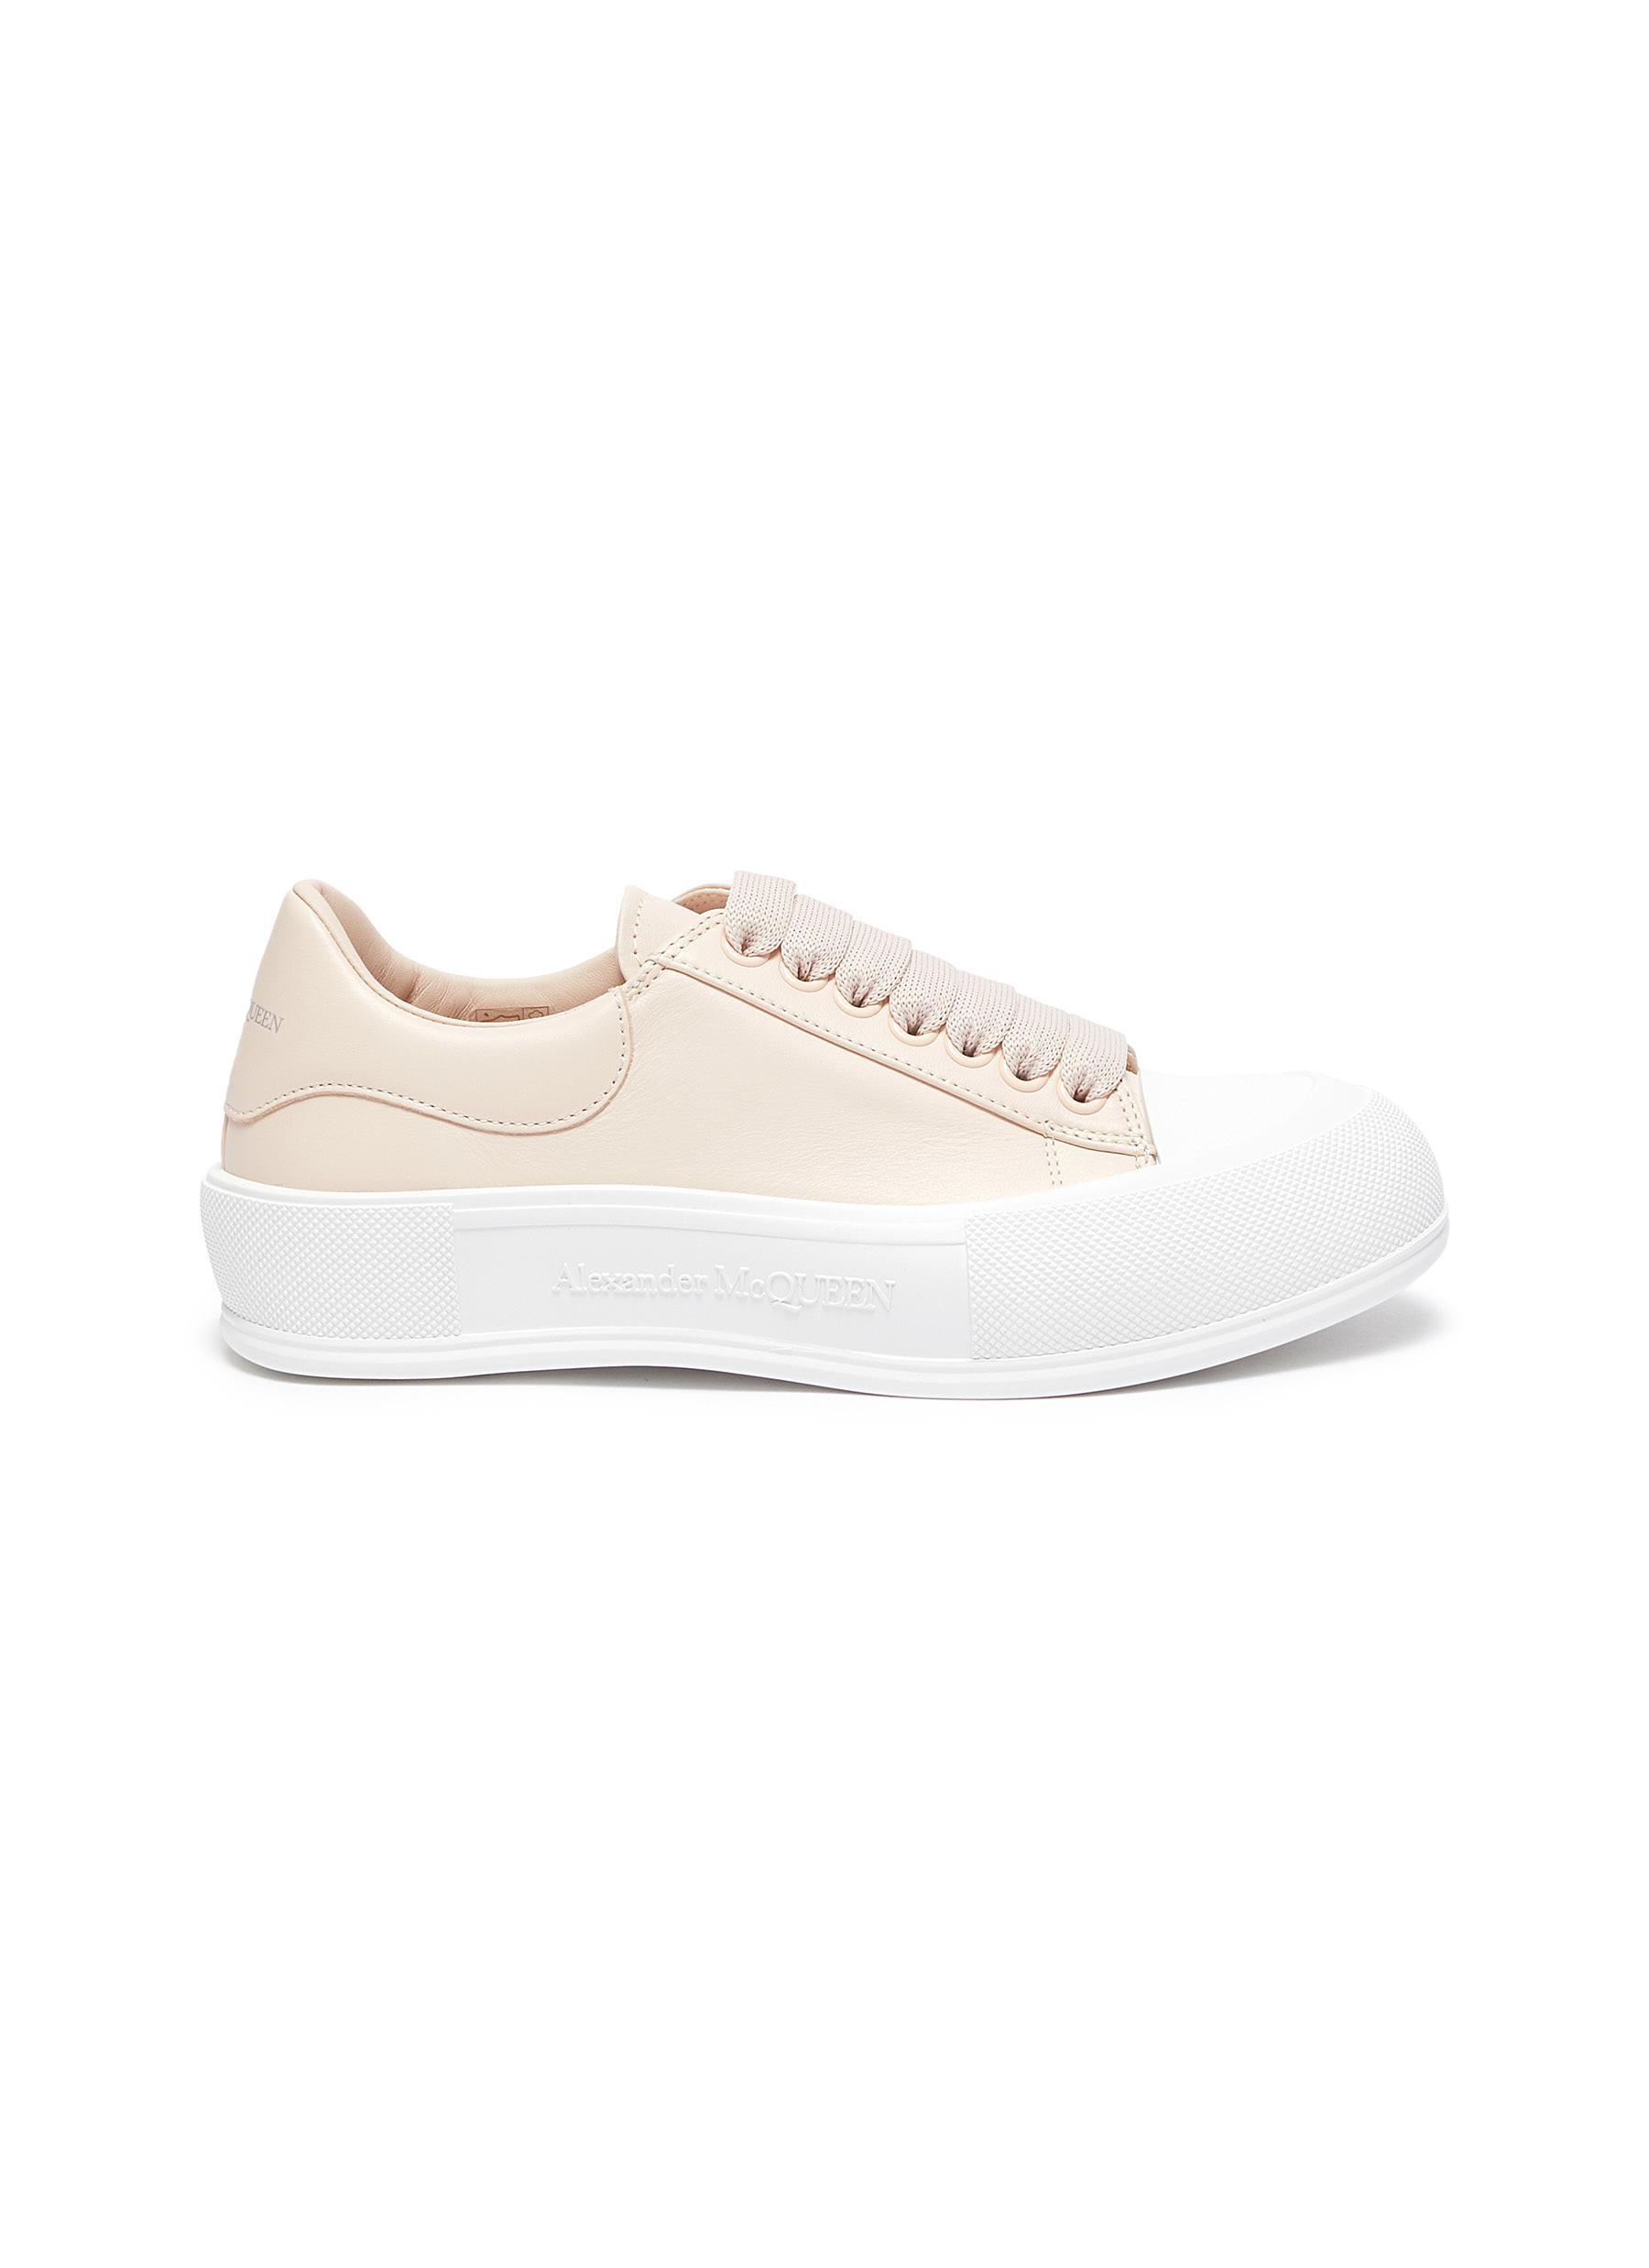 Deck Plimsoll' Low Top Leather Sneakers